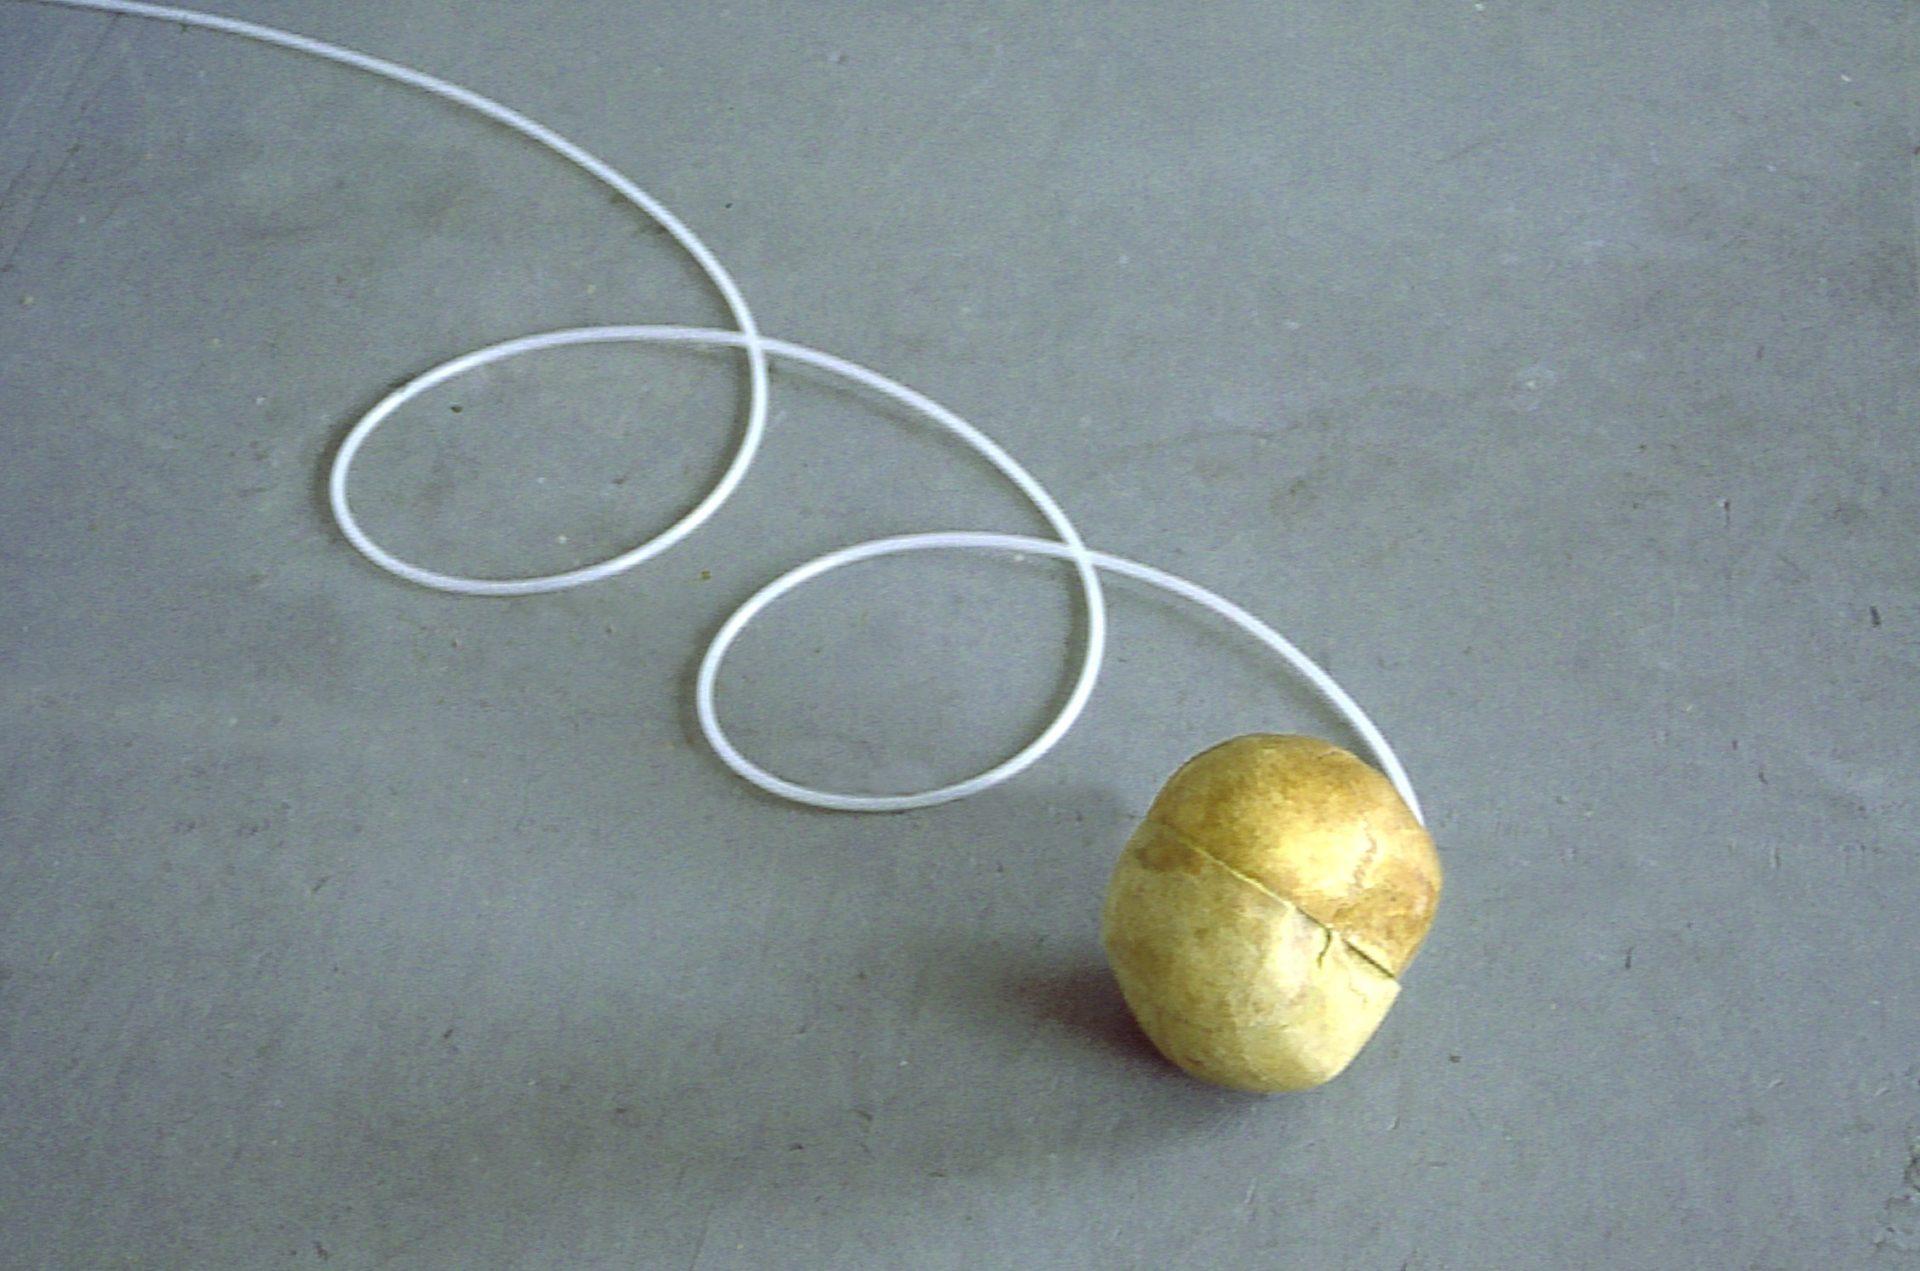 socker ball : balon de futbol_lge